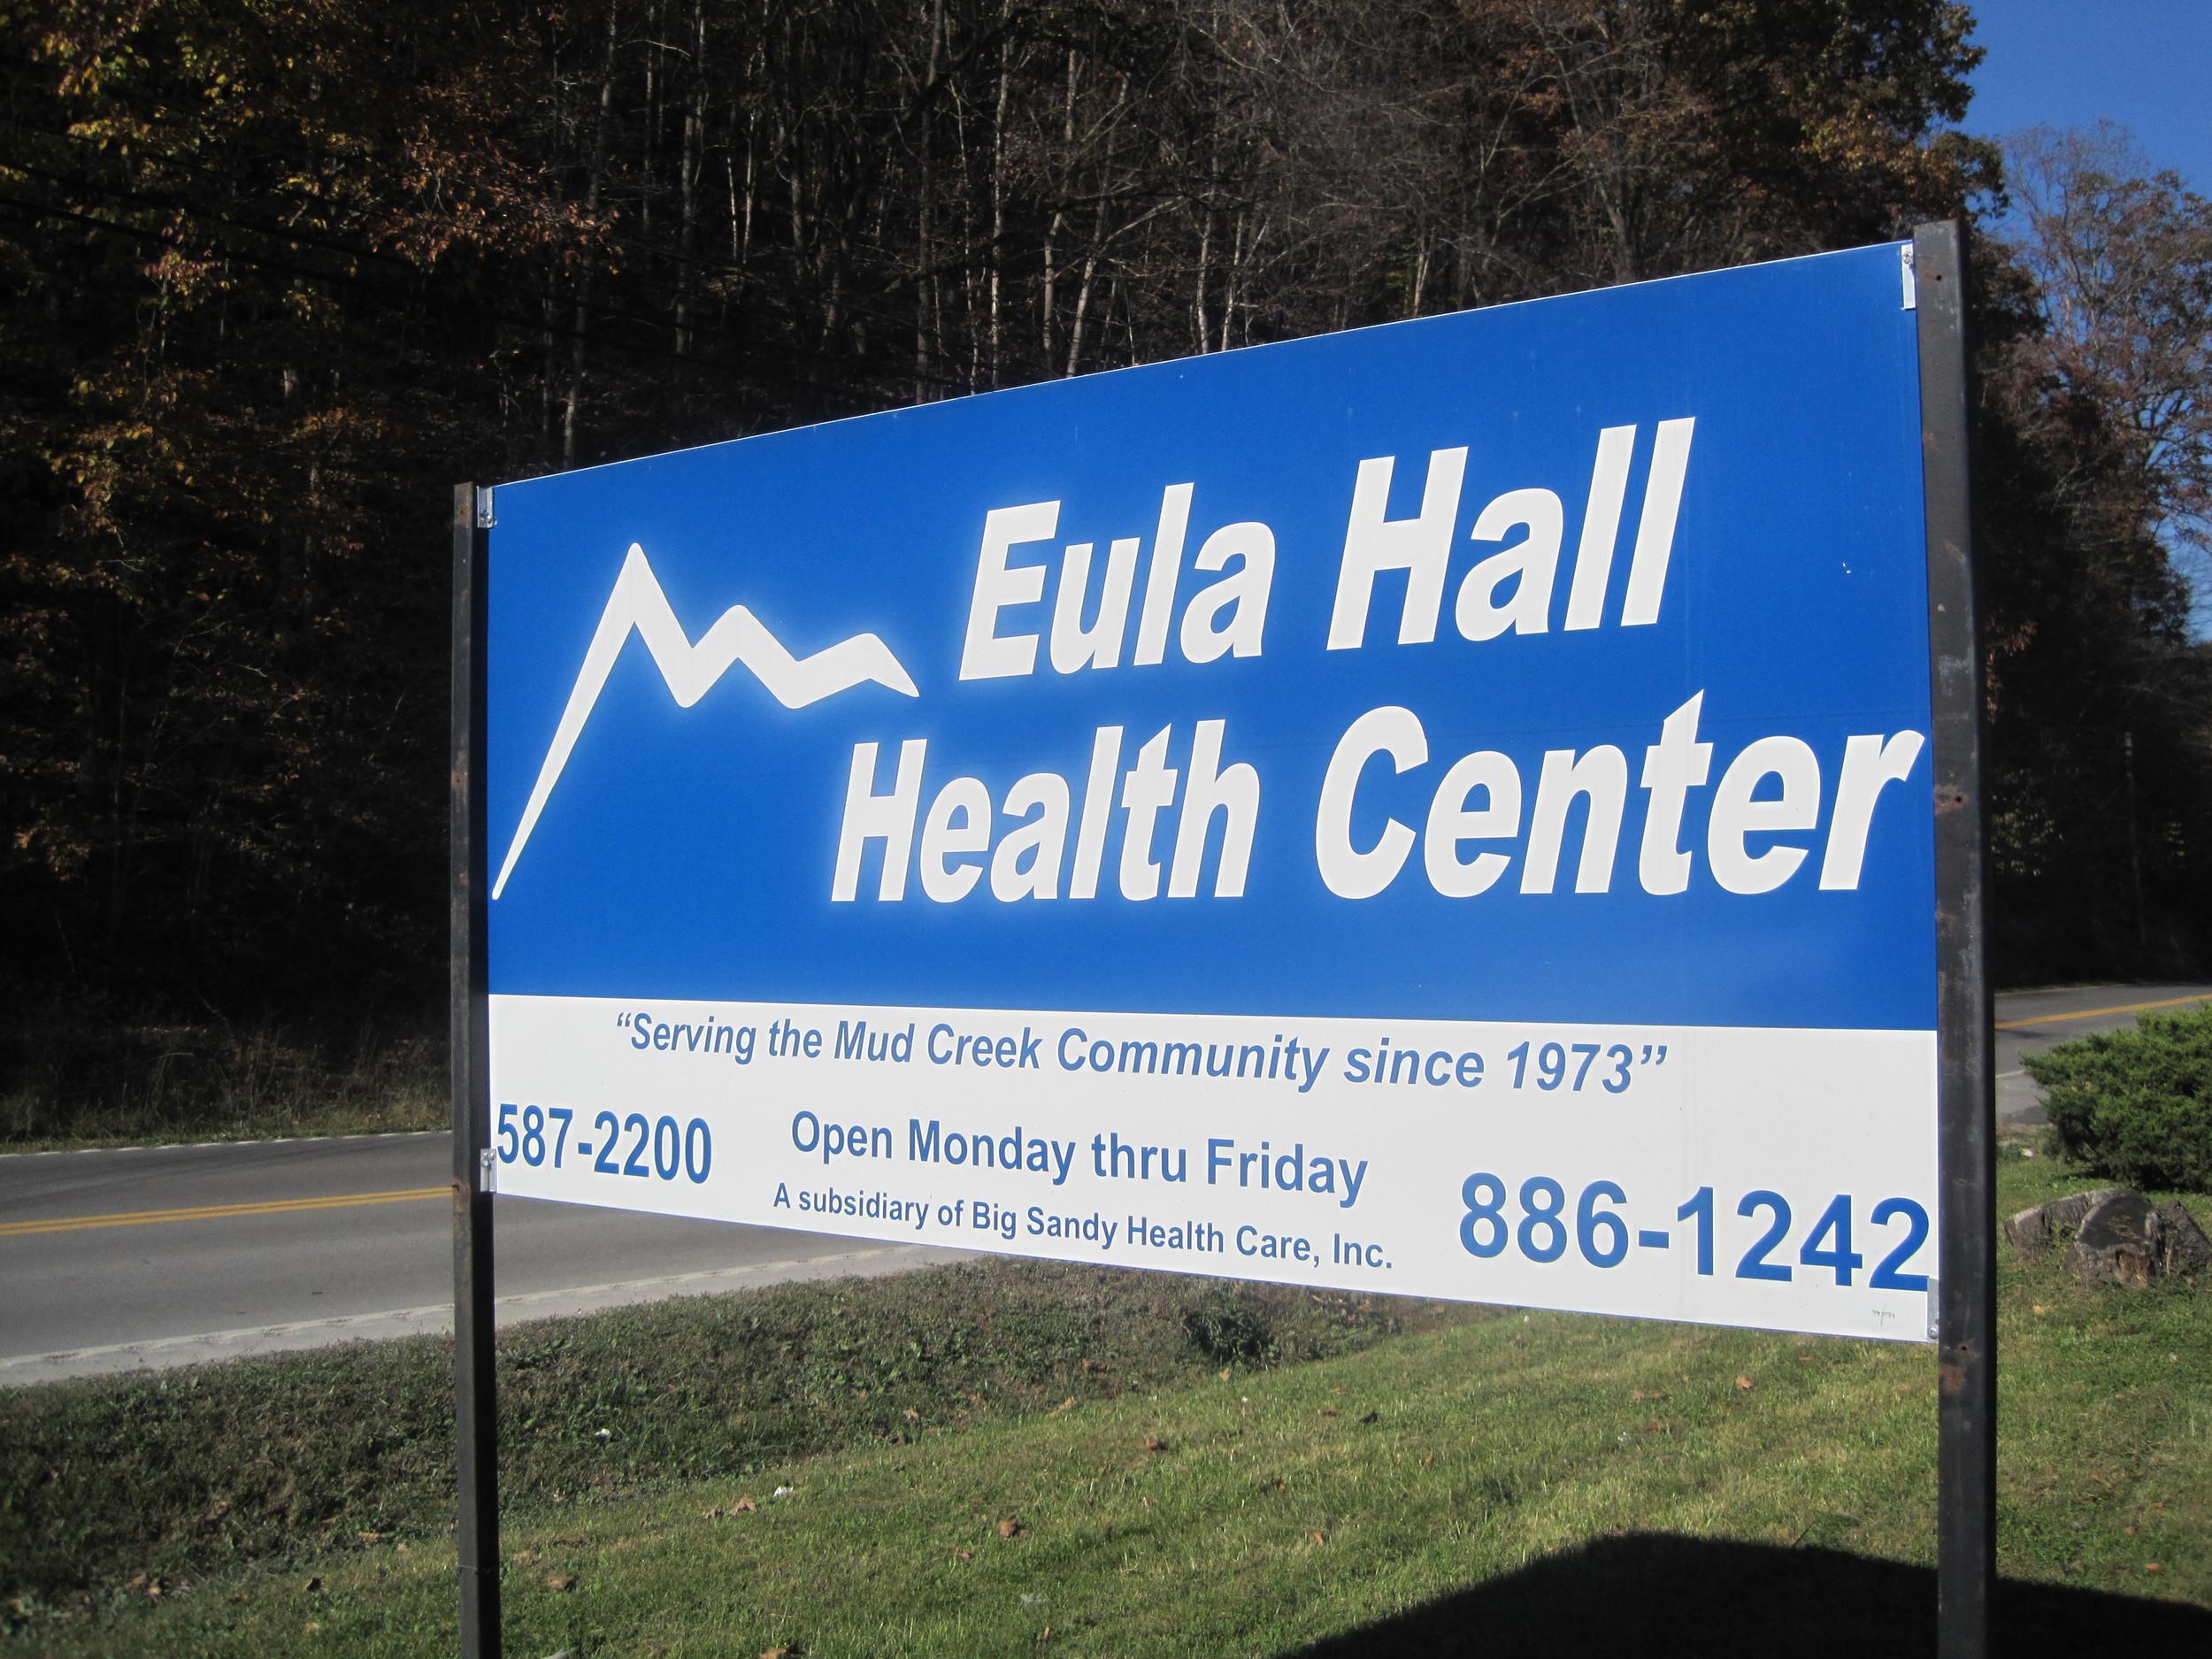 17-Eula Hall Health Center Sign.jpg